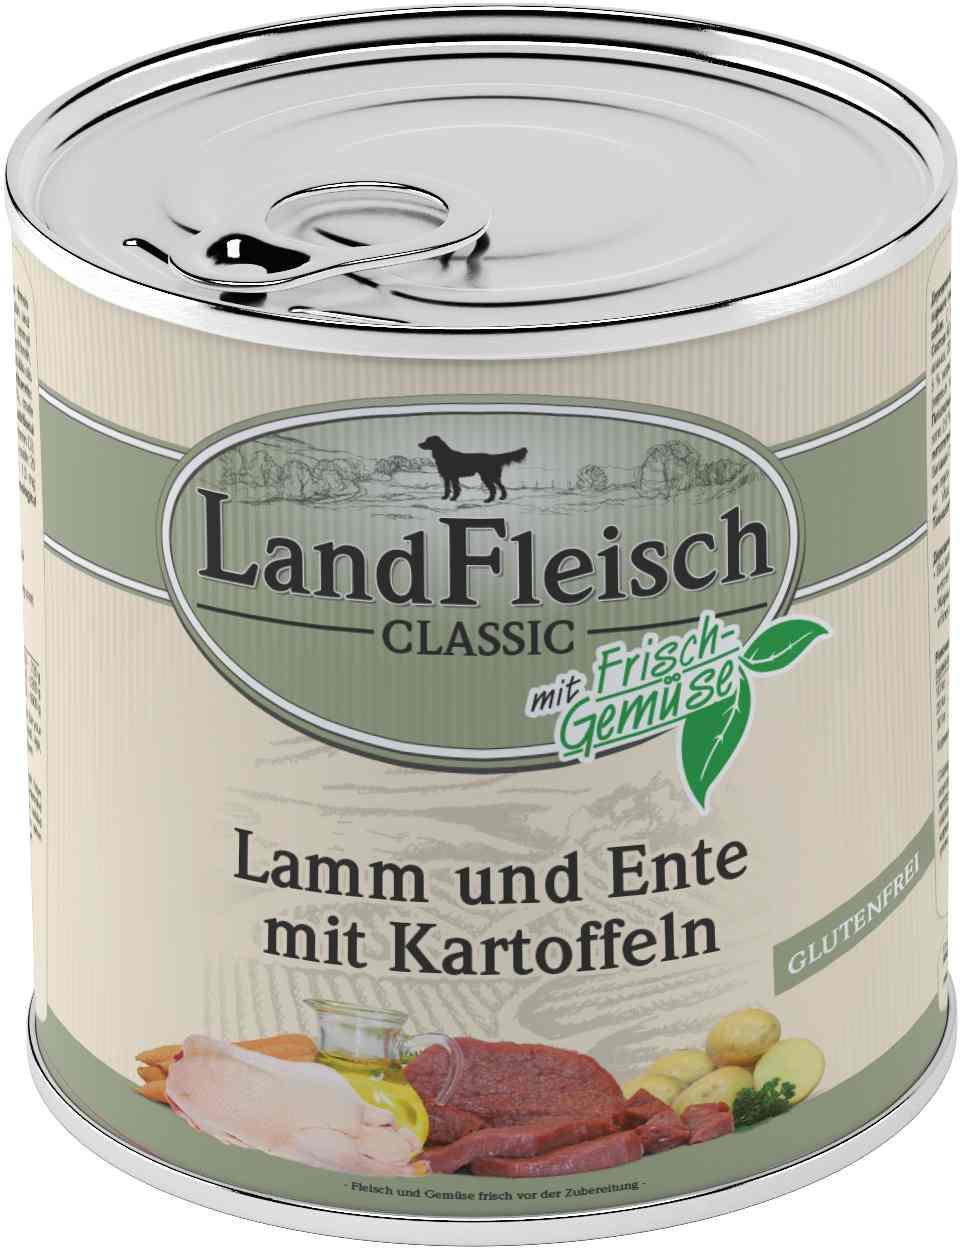 Landfleisch Dog Classic Lamm, Ente, Kart. 800g